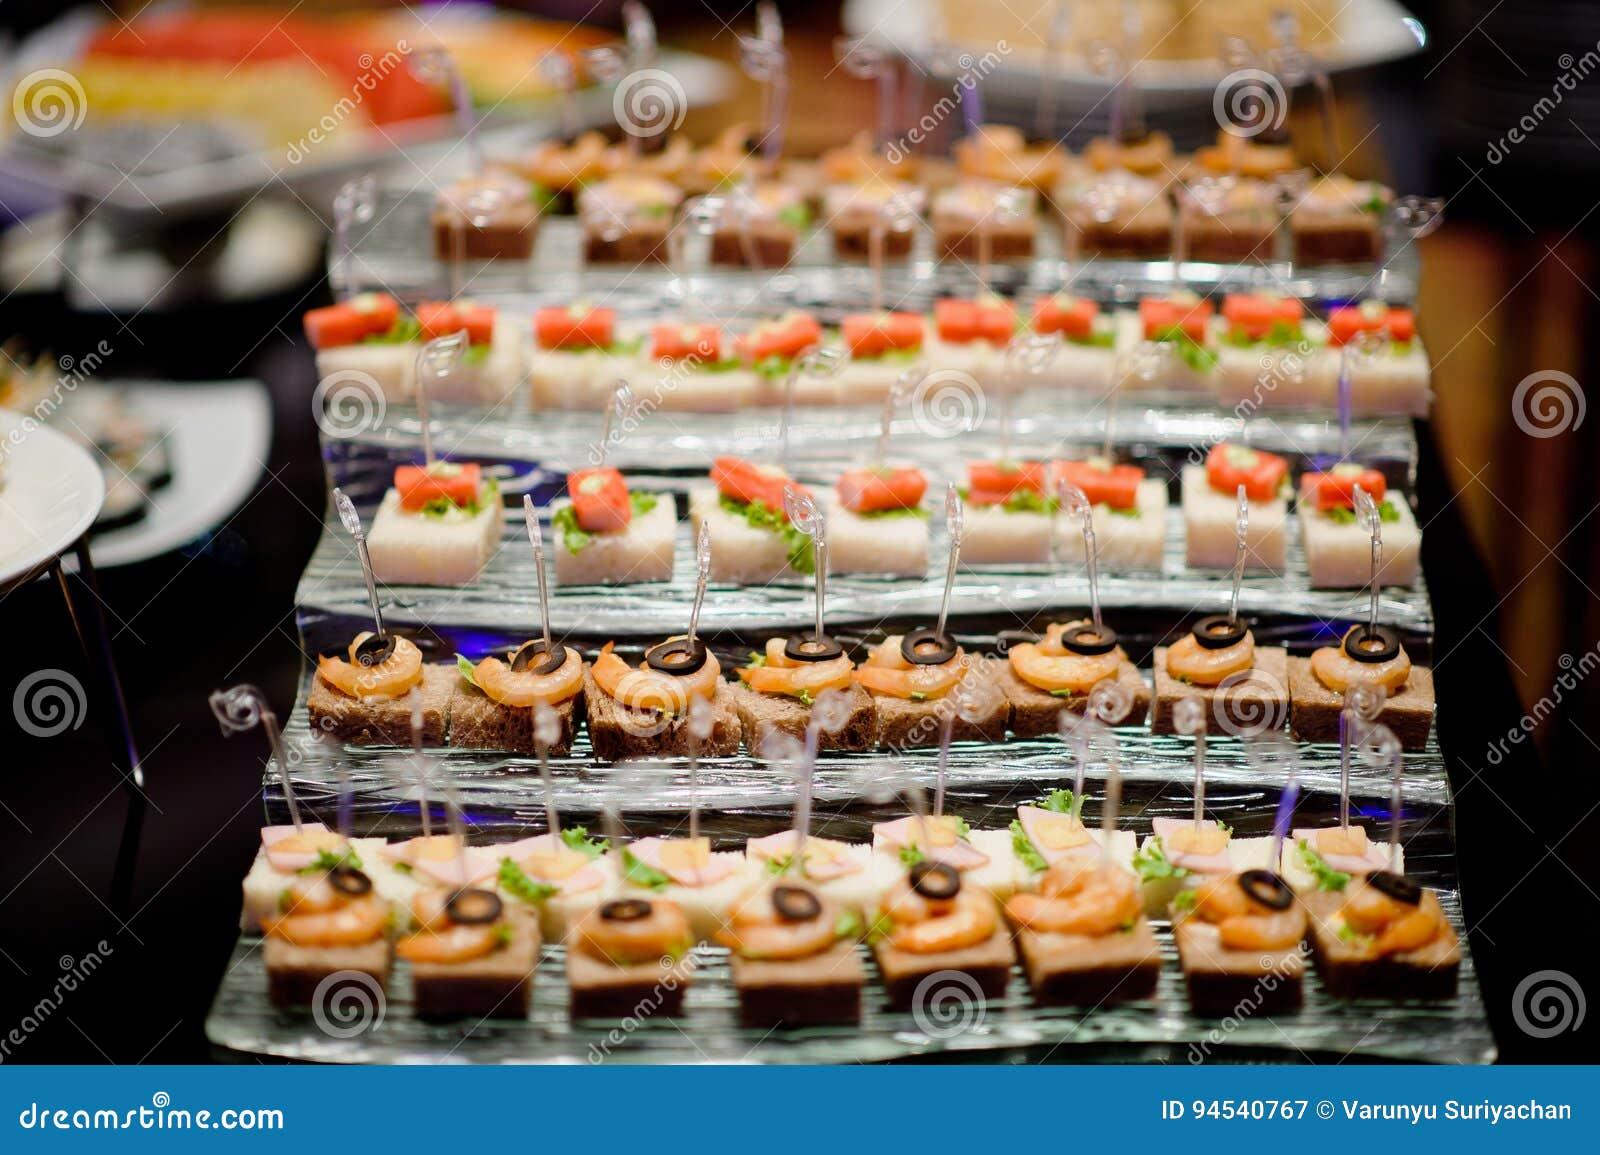 Cocktail Food Catering Dessert Wedding Stock Image - Image ...